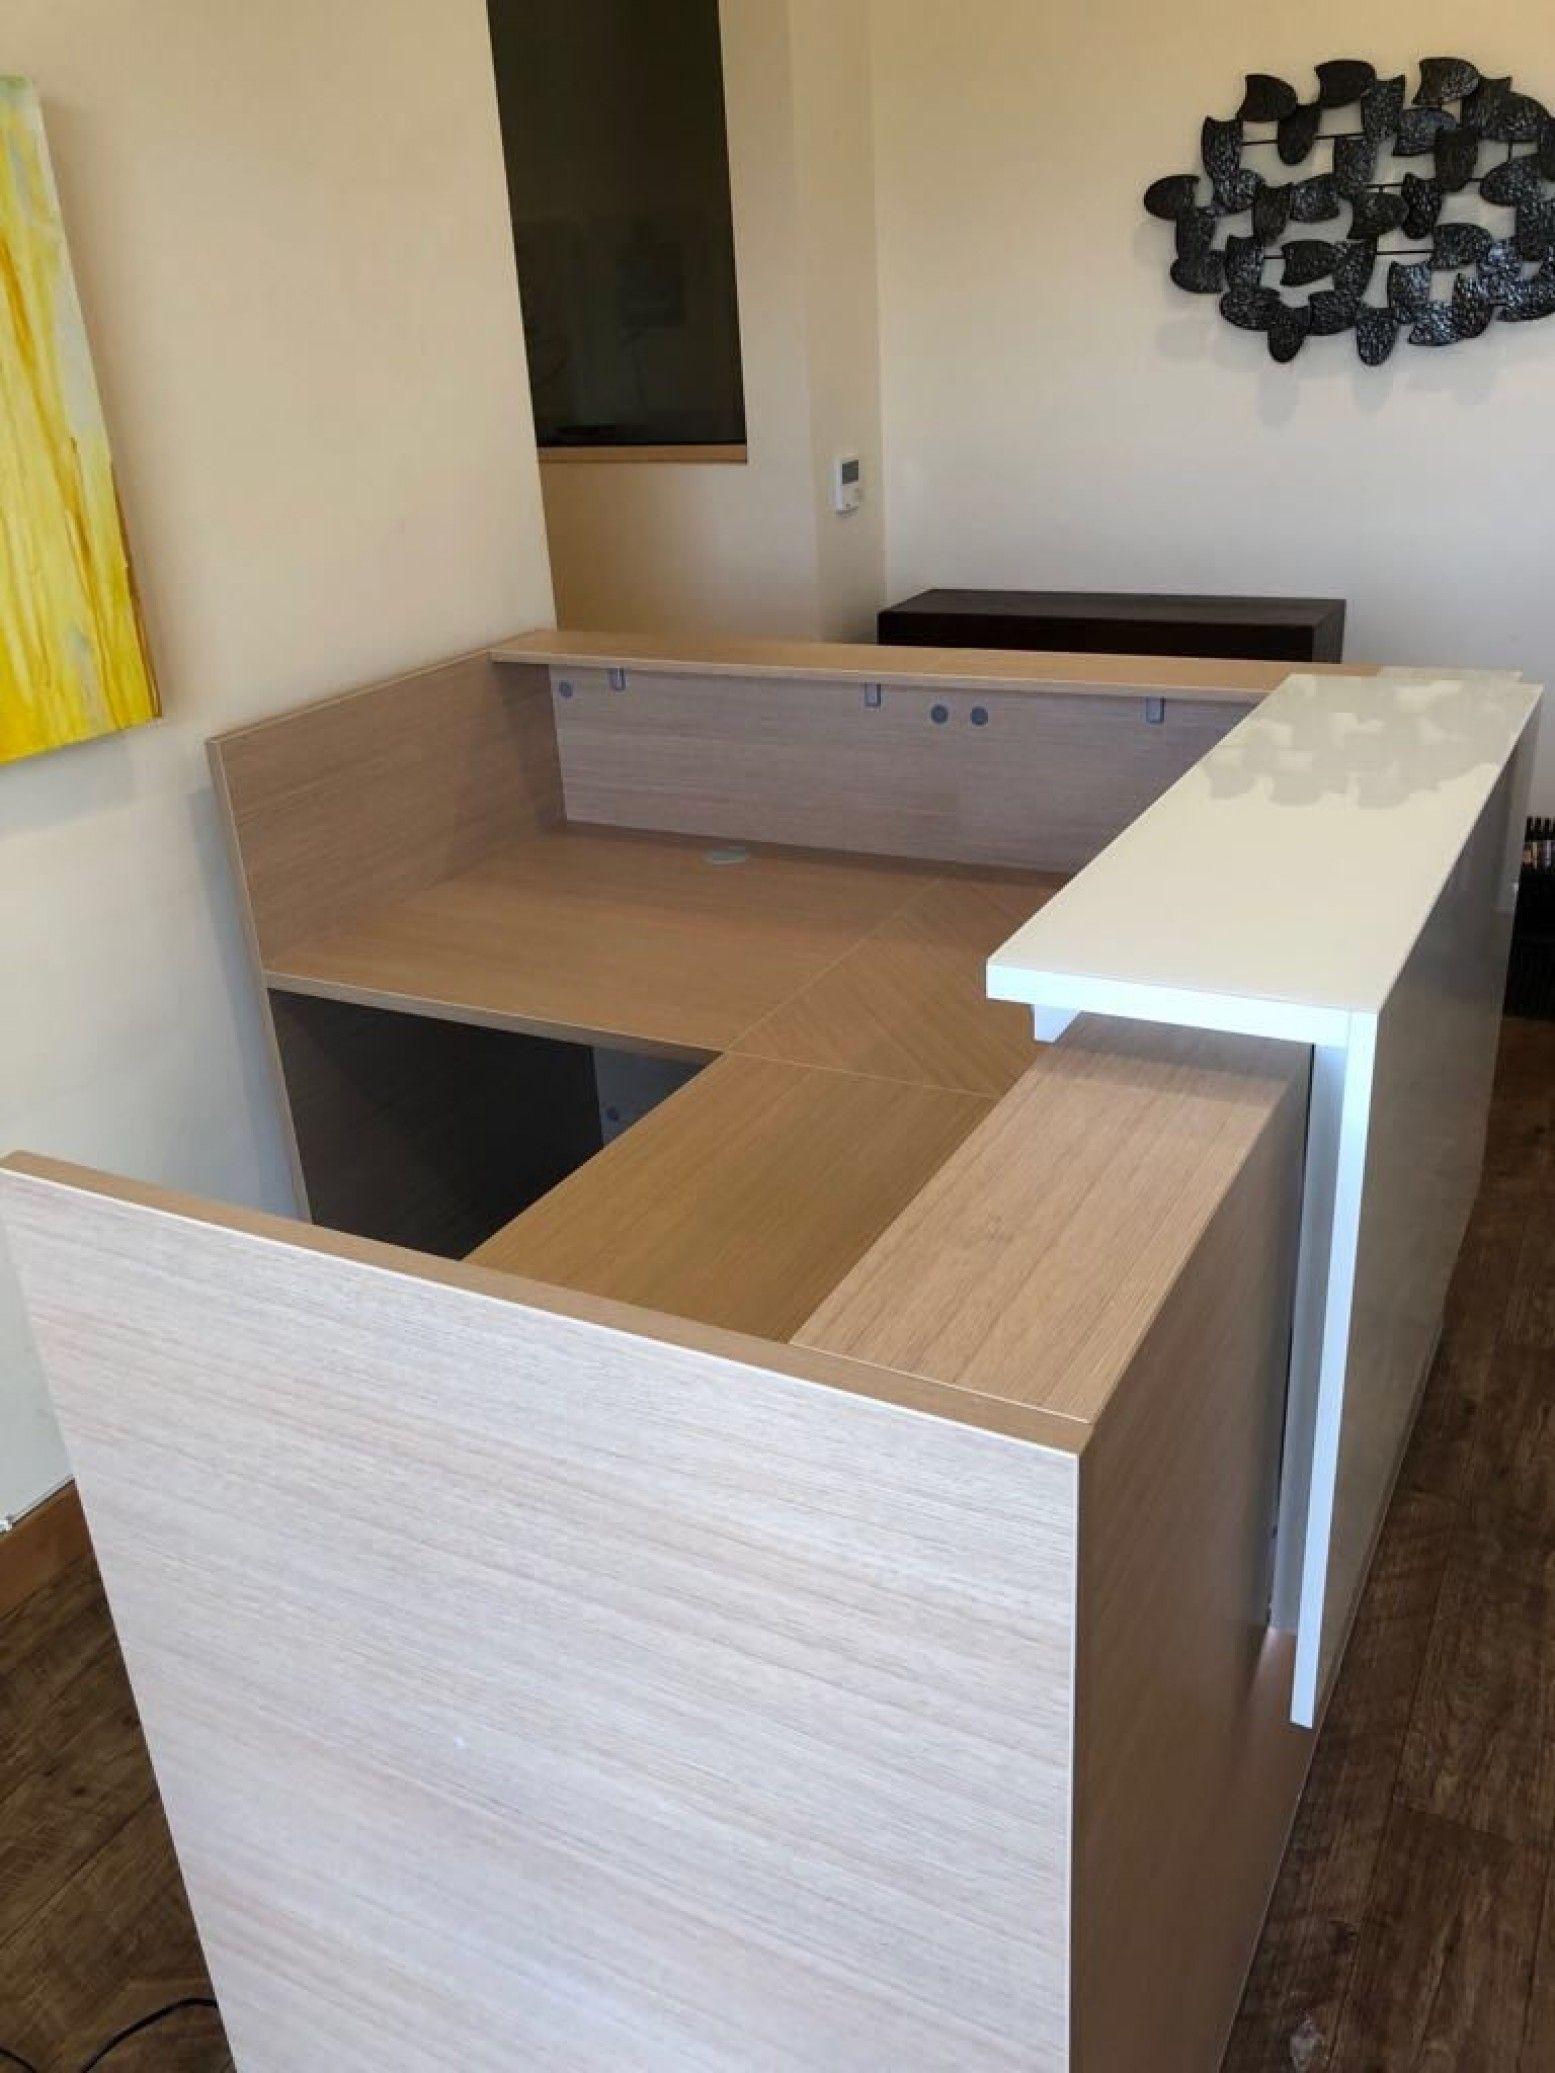 Small L Shaped Reception Desk Office Furniture Right Or Left Return In 6 Colors Reception Desk Office Reception Table Design Reception Desk Office Furniture